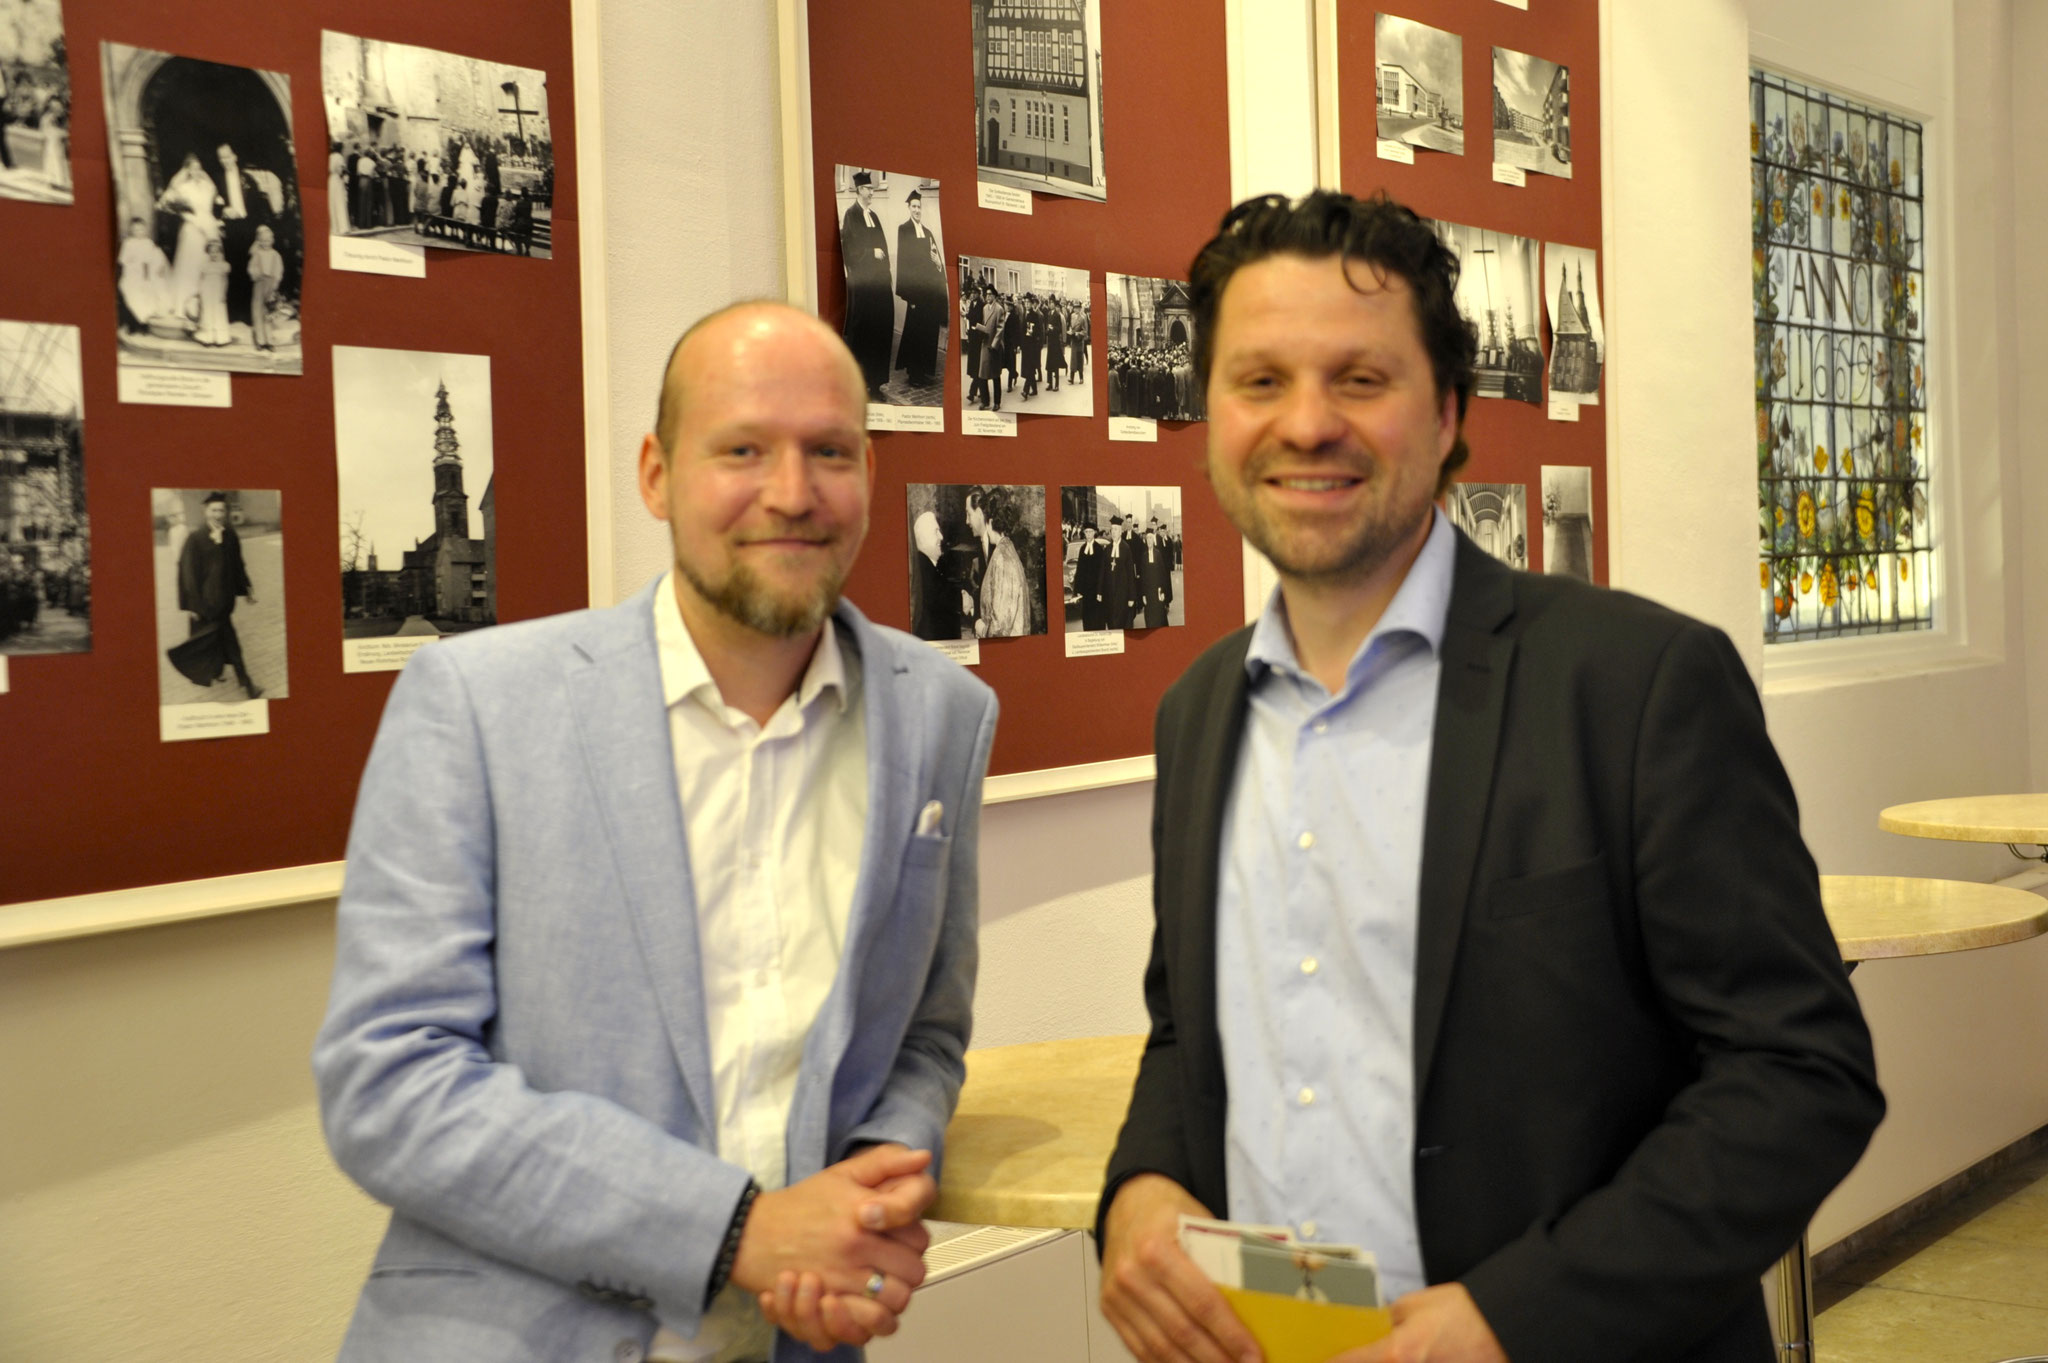 vl: Phillip Schmalstieg, Büro Jasmin Fahimi MdB und Alptekin Kirci MdL, Stadtverbandsvorsitzender der SPD